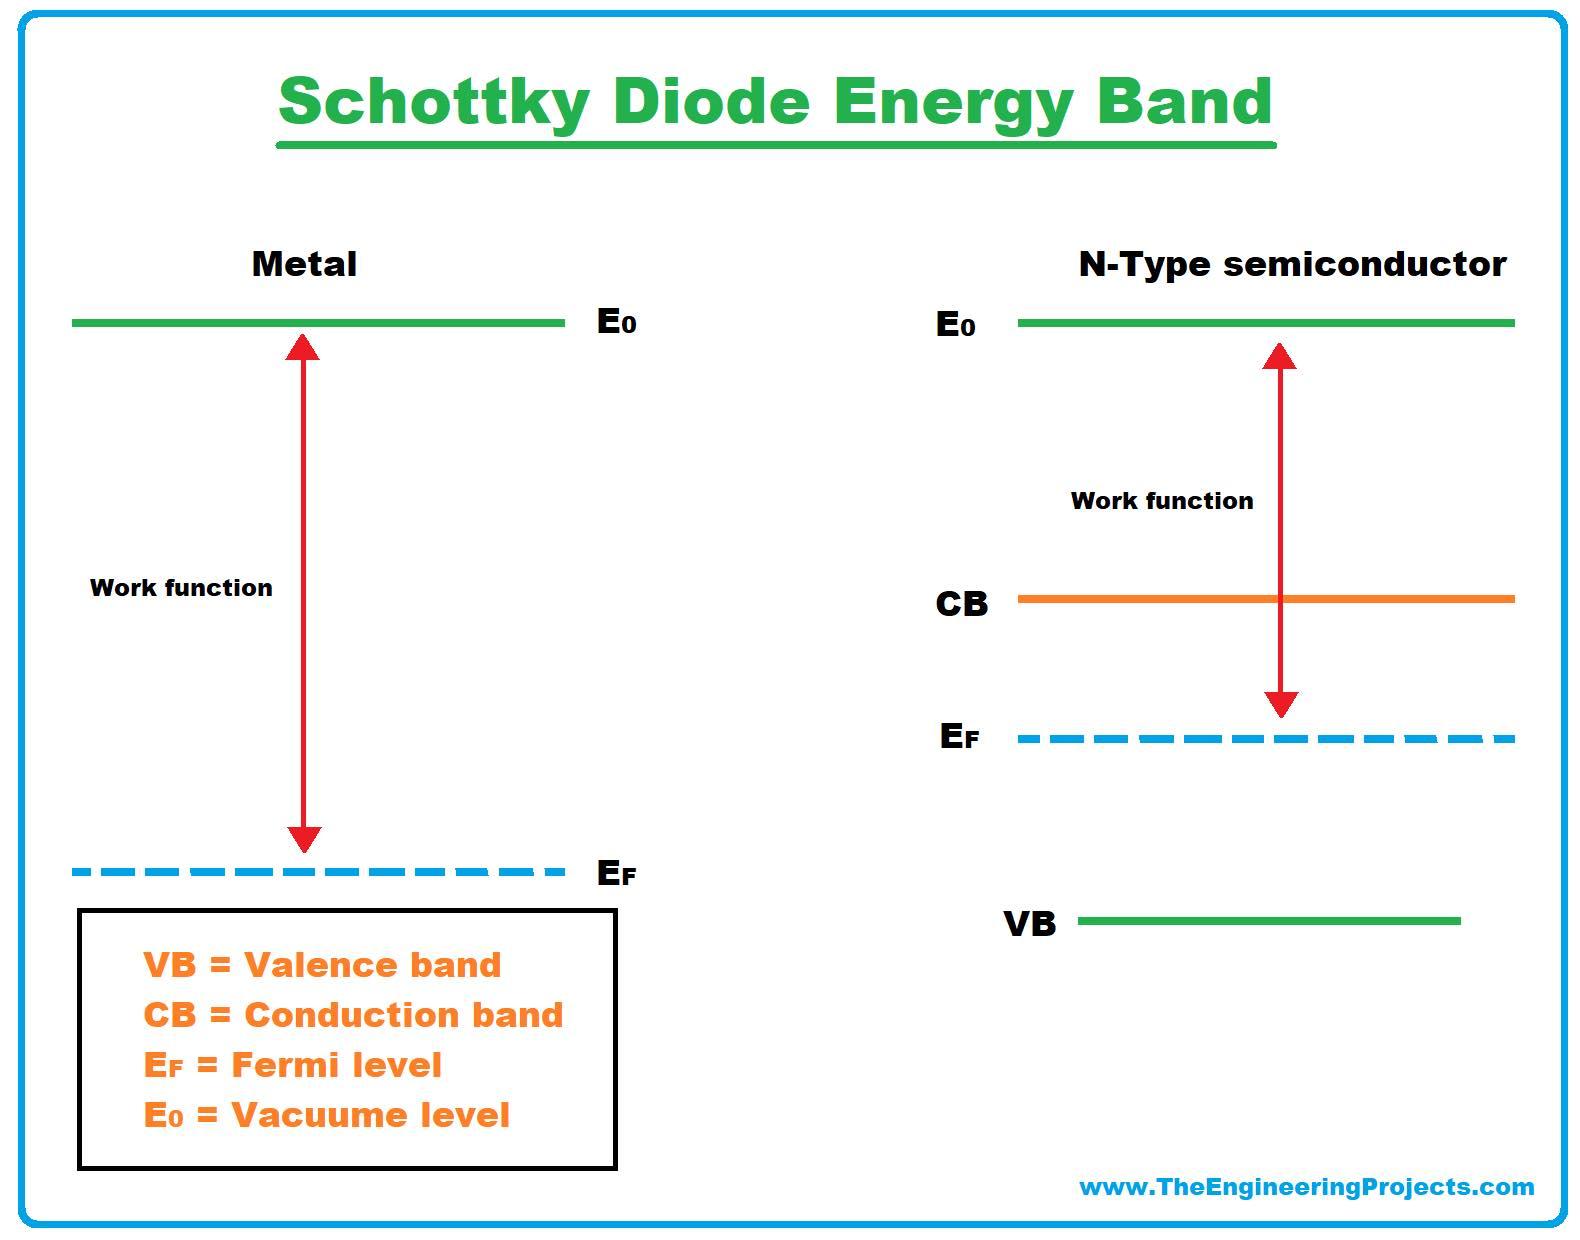 Schottky Diode, Schottky barrier diode, Schottky barrier, Schottky Diode working, Schottky Diode energy bands, energy bands of schottky diode, Schottky Diode characteristics